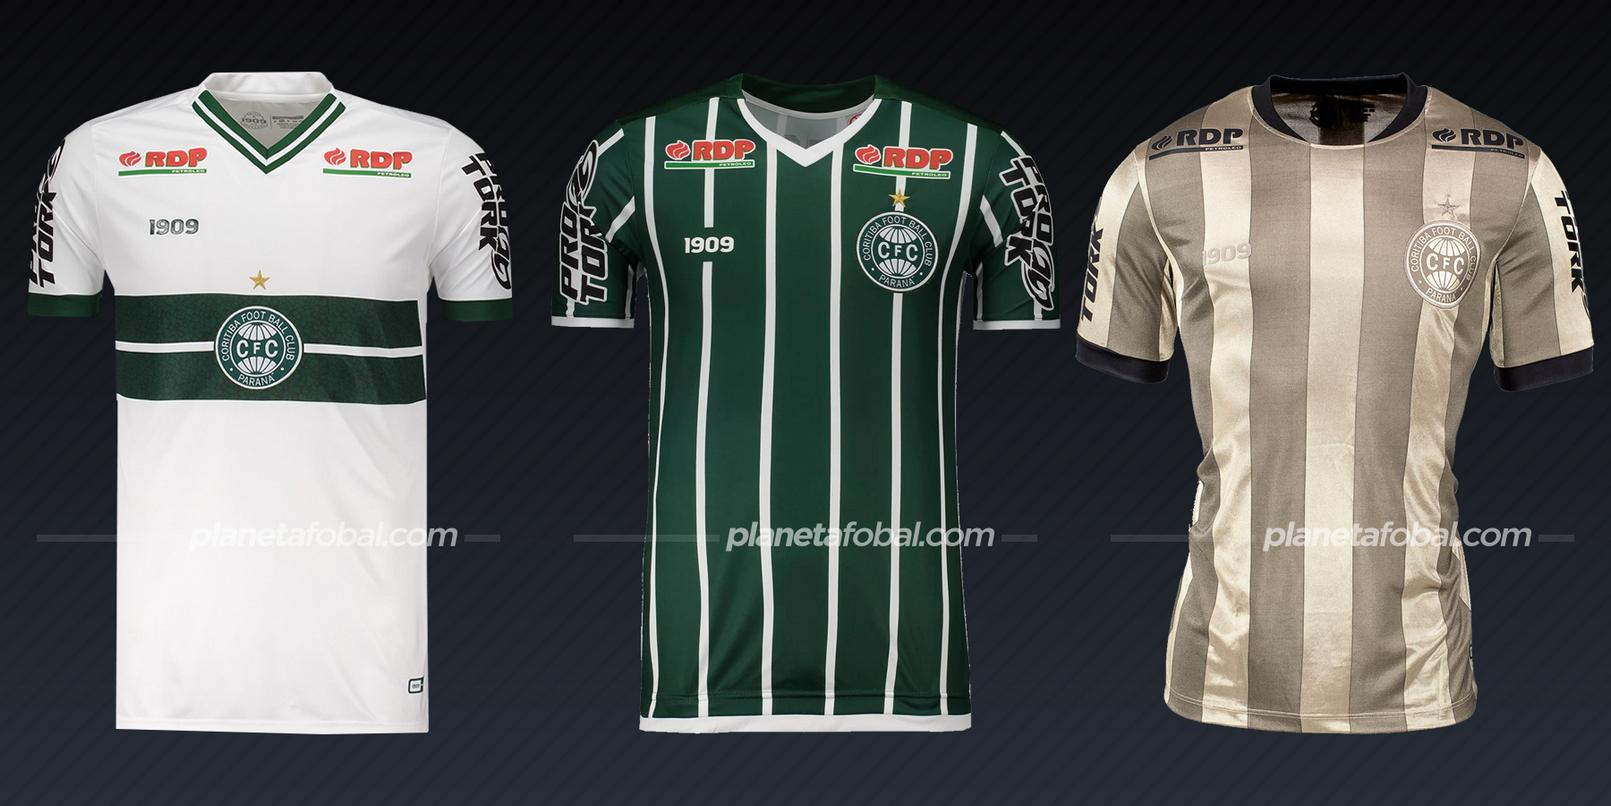 Coritiba (1909) | Camisetas del Brasileirão 2020